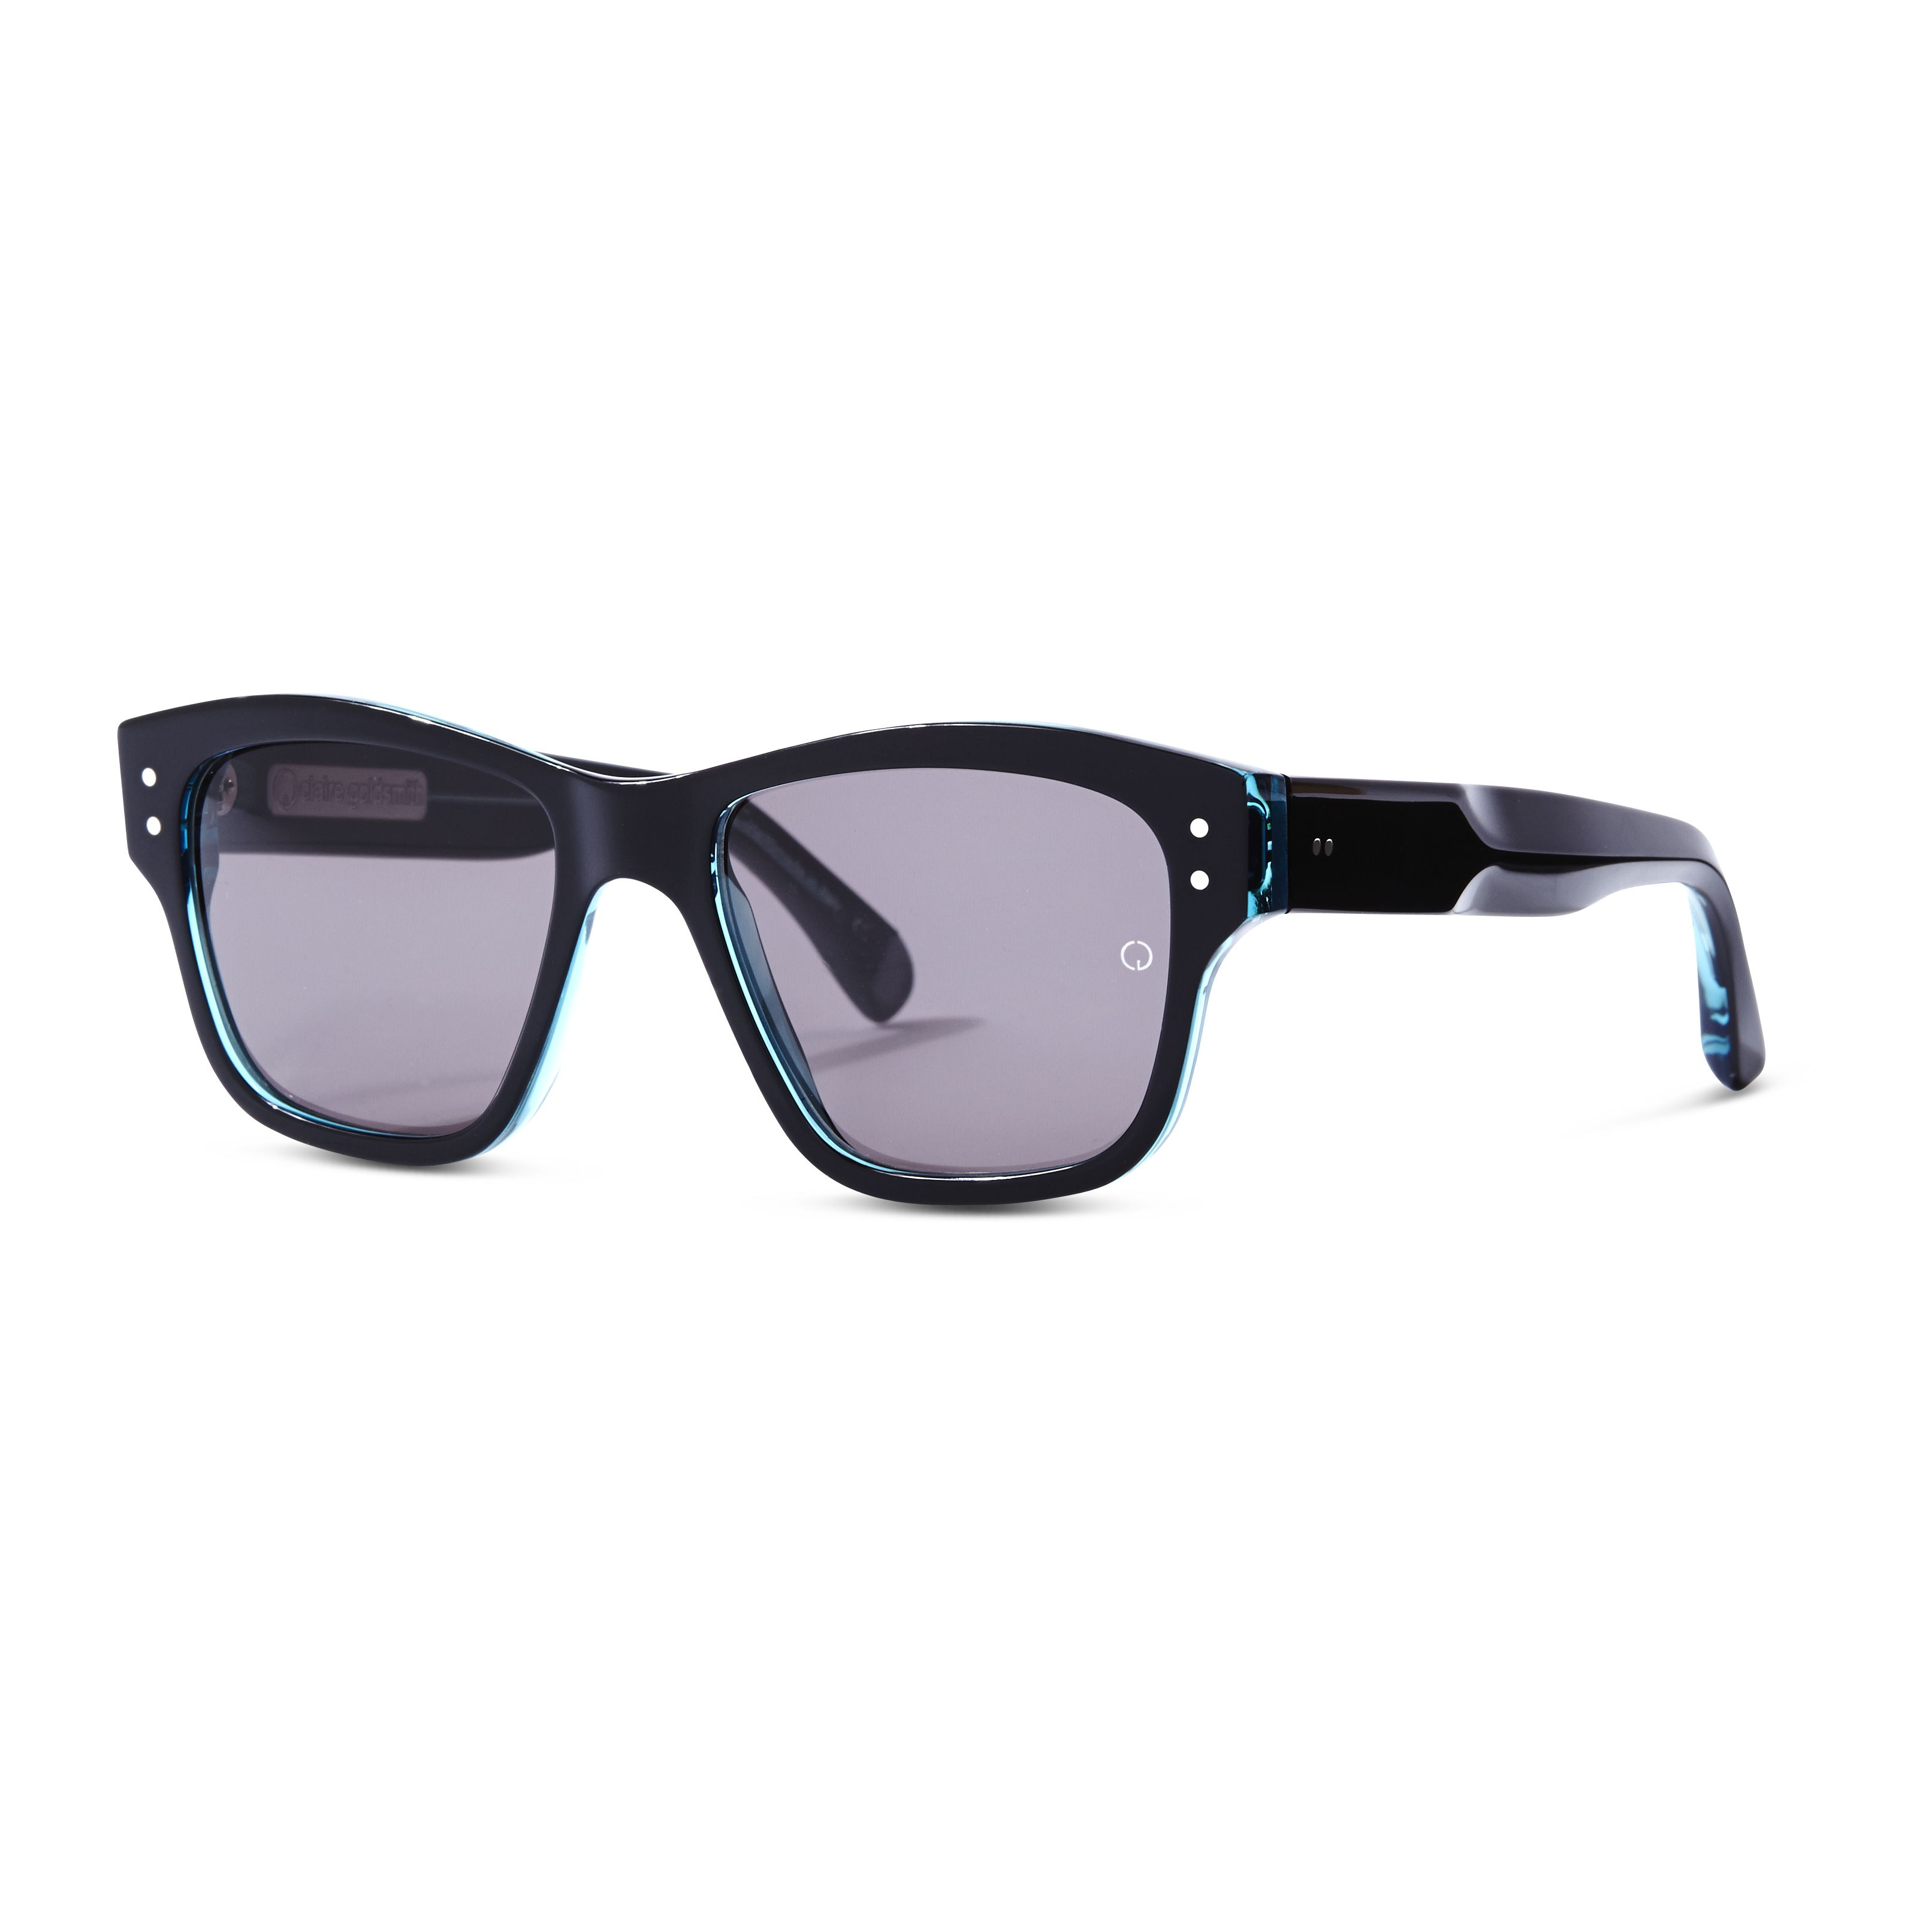 e1b08d9a88c Carters in  Black on Liquorice  Claire Goldsmith Eyewear -  sunglasses   clairegoldsmith  eyewear  british